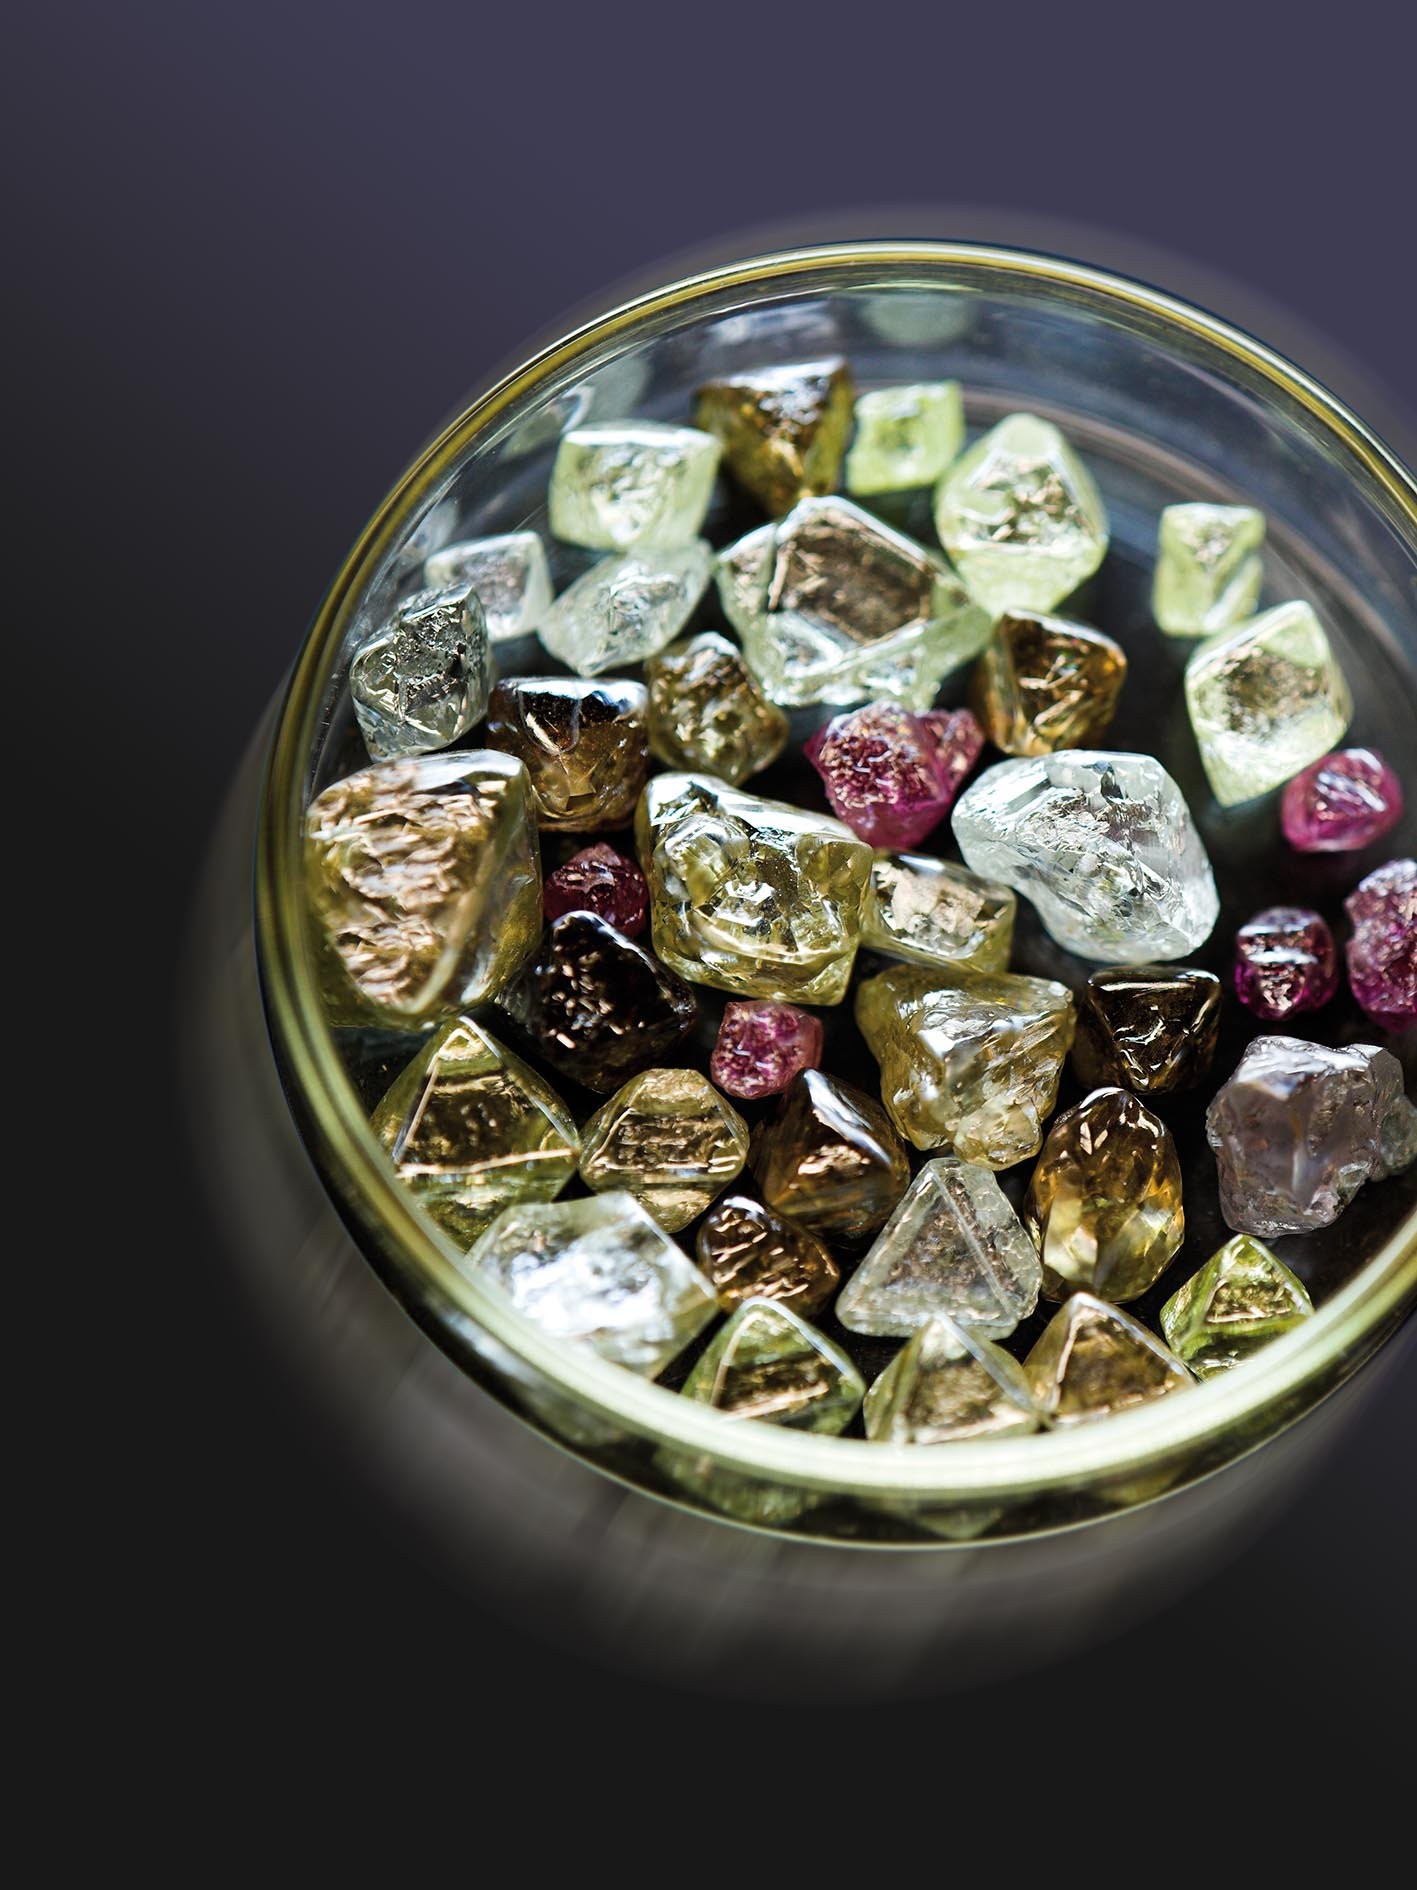 Photo courtesy of the Diamonds Producers Association.